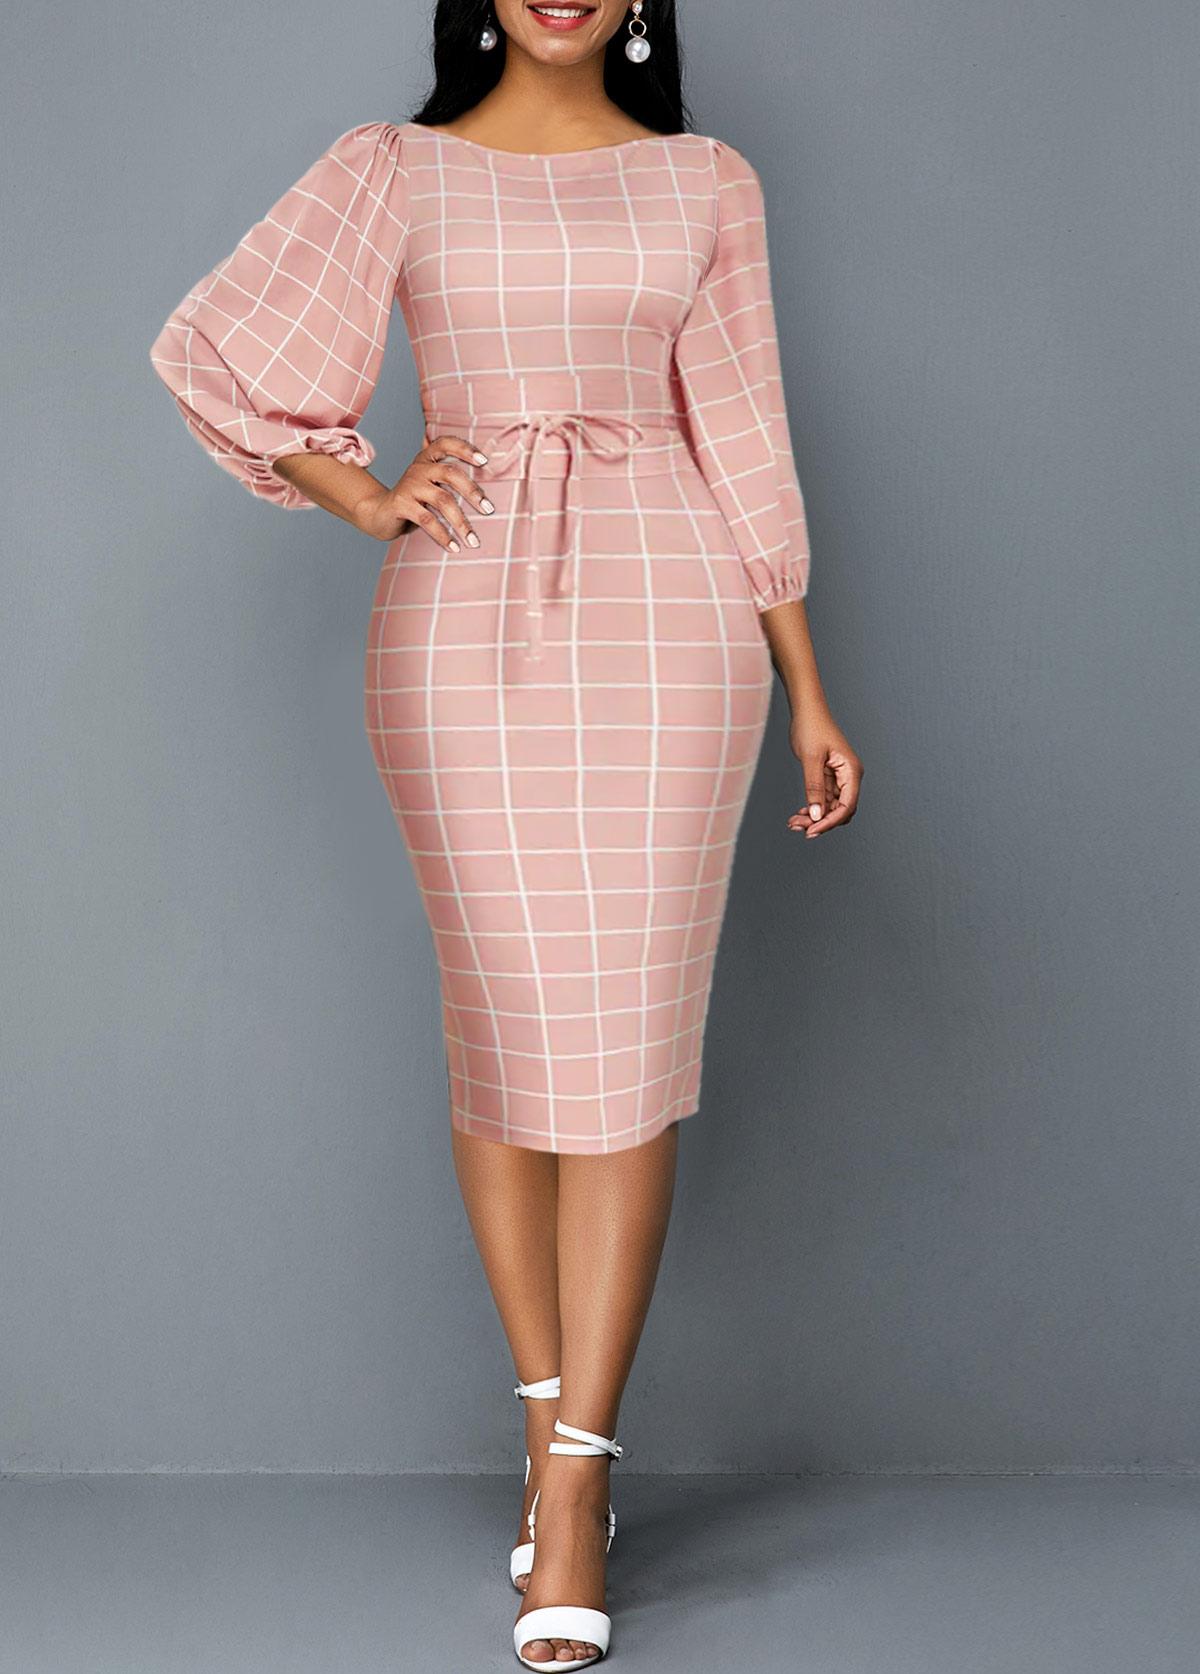 Plaid Print Tie Front Lantern Sleeve Sheath Dress